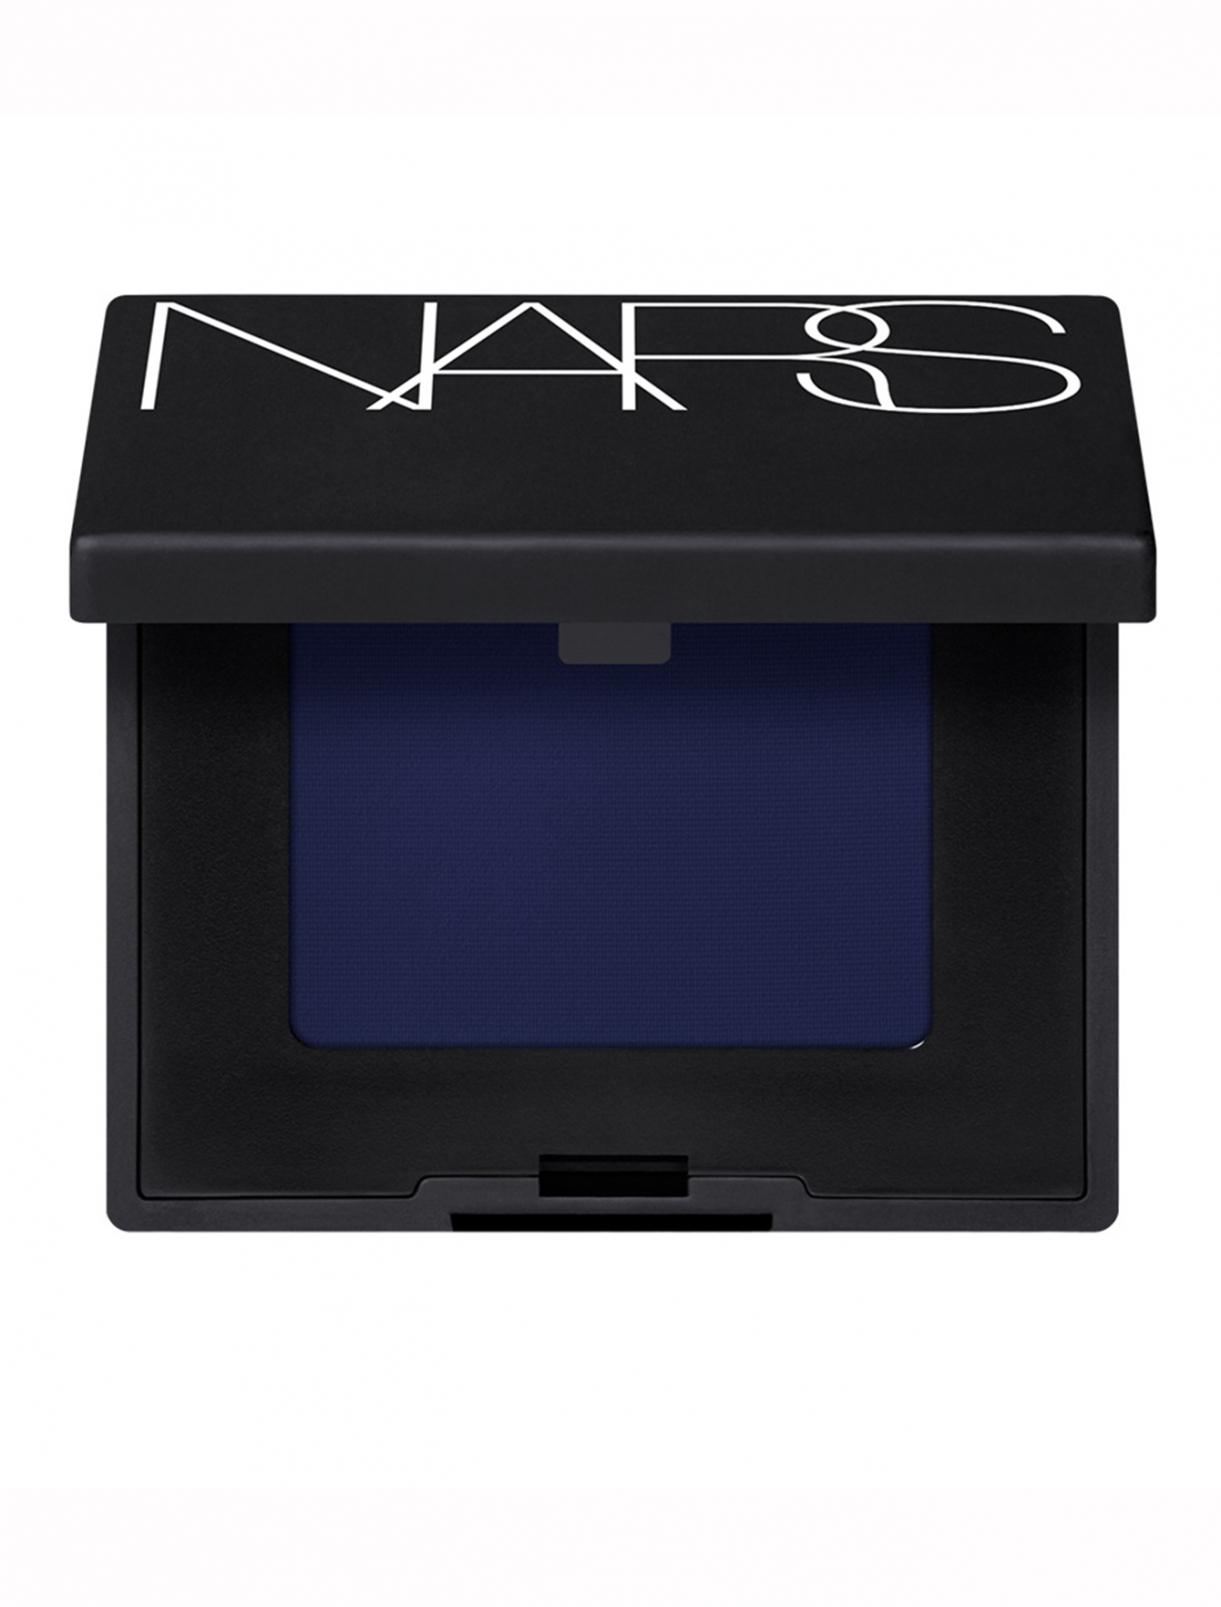 Монотени для век China Blue Makeup NARS  –  Общий вид